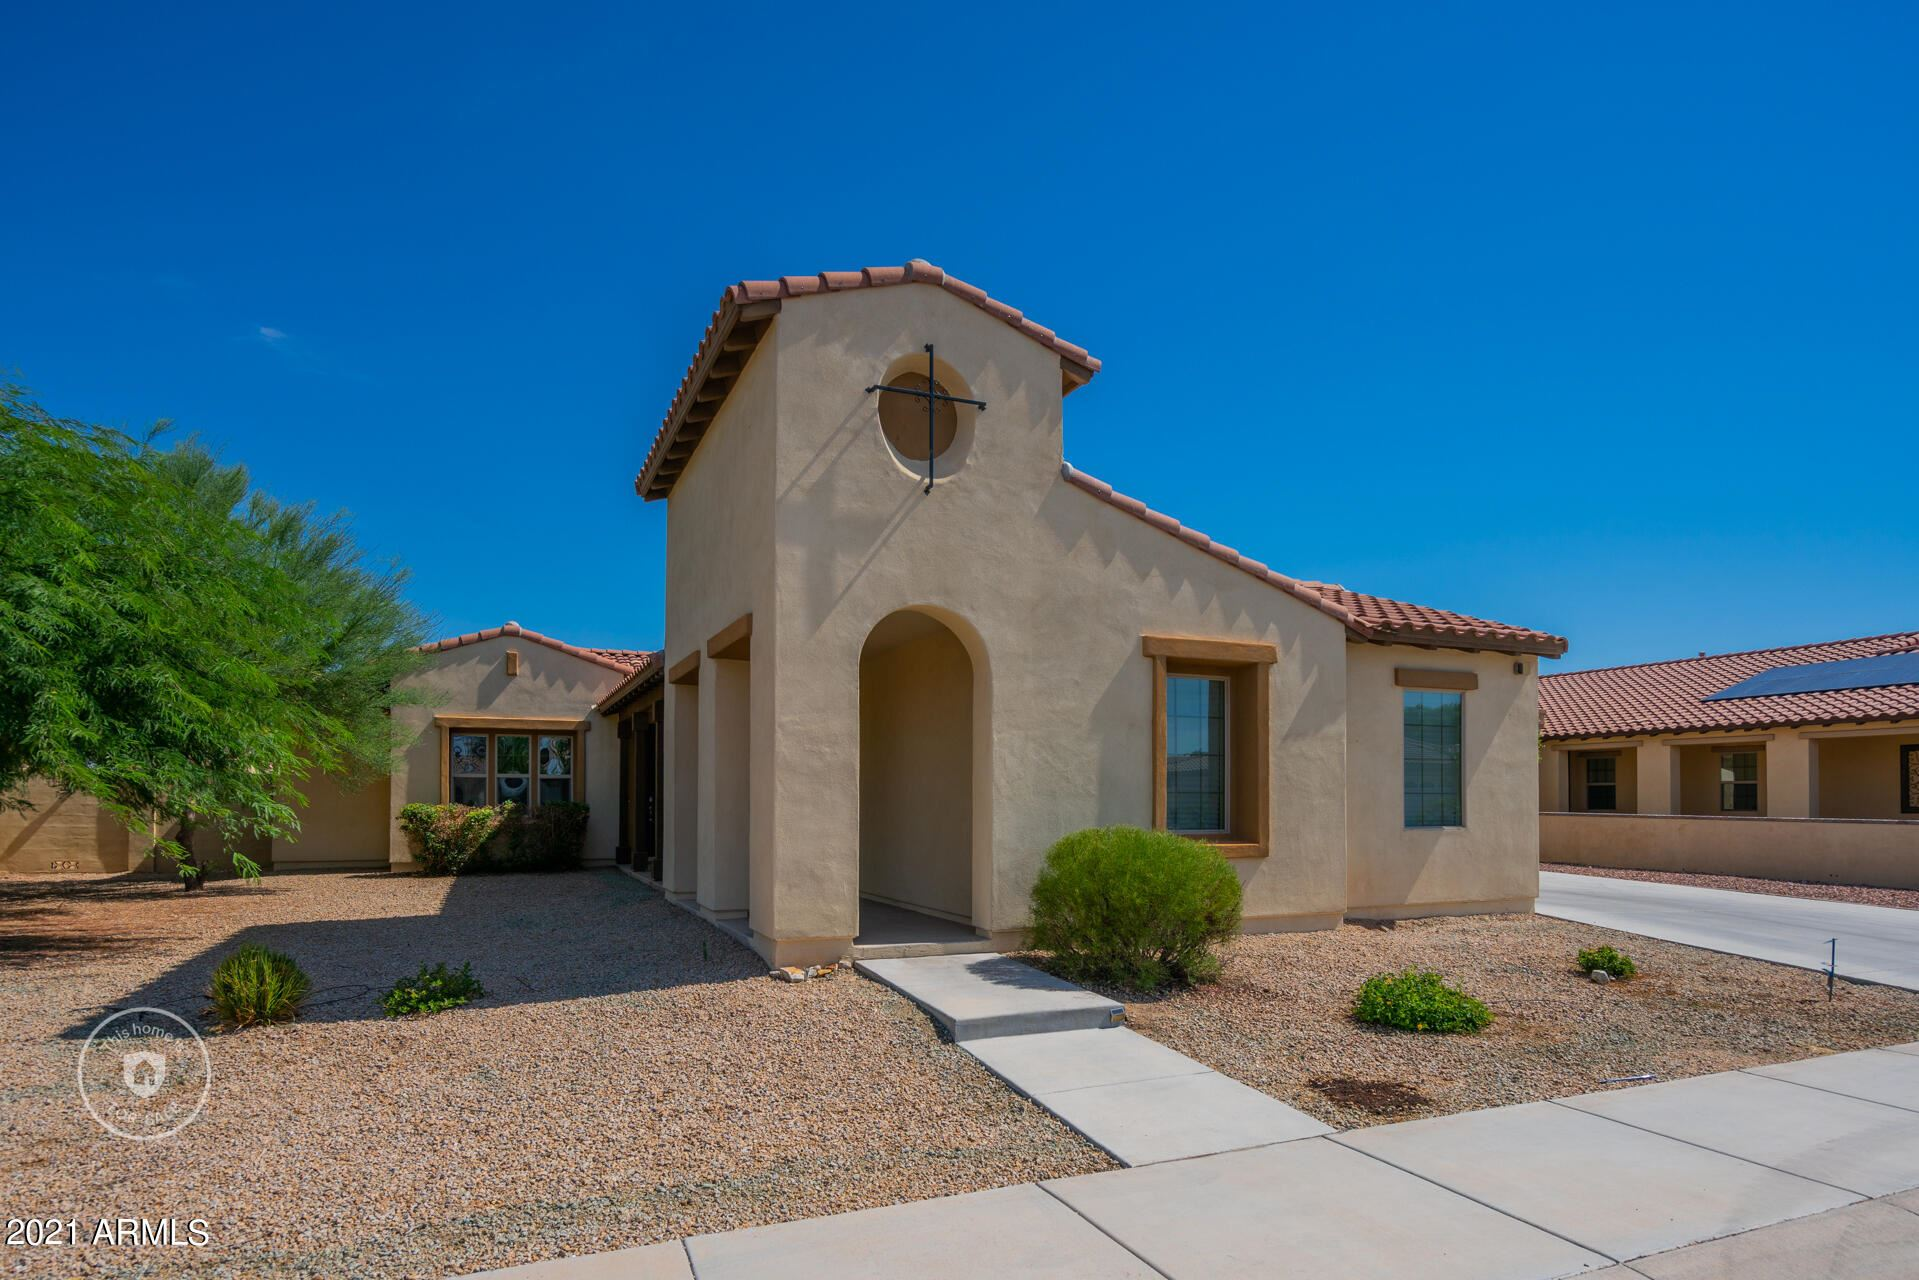 16182 W HOLLY Street, Goodyear, AZ 85395 - MLS#: 6261619